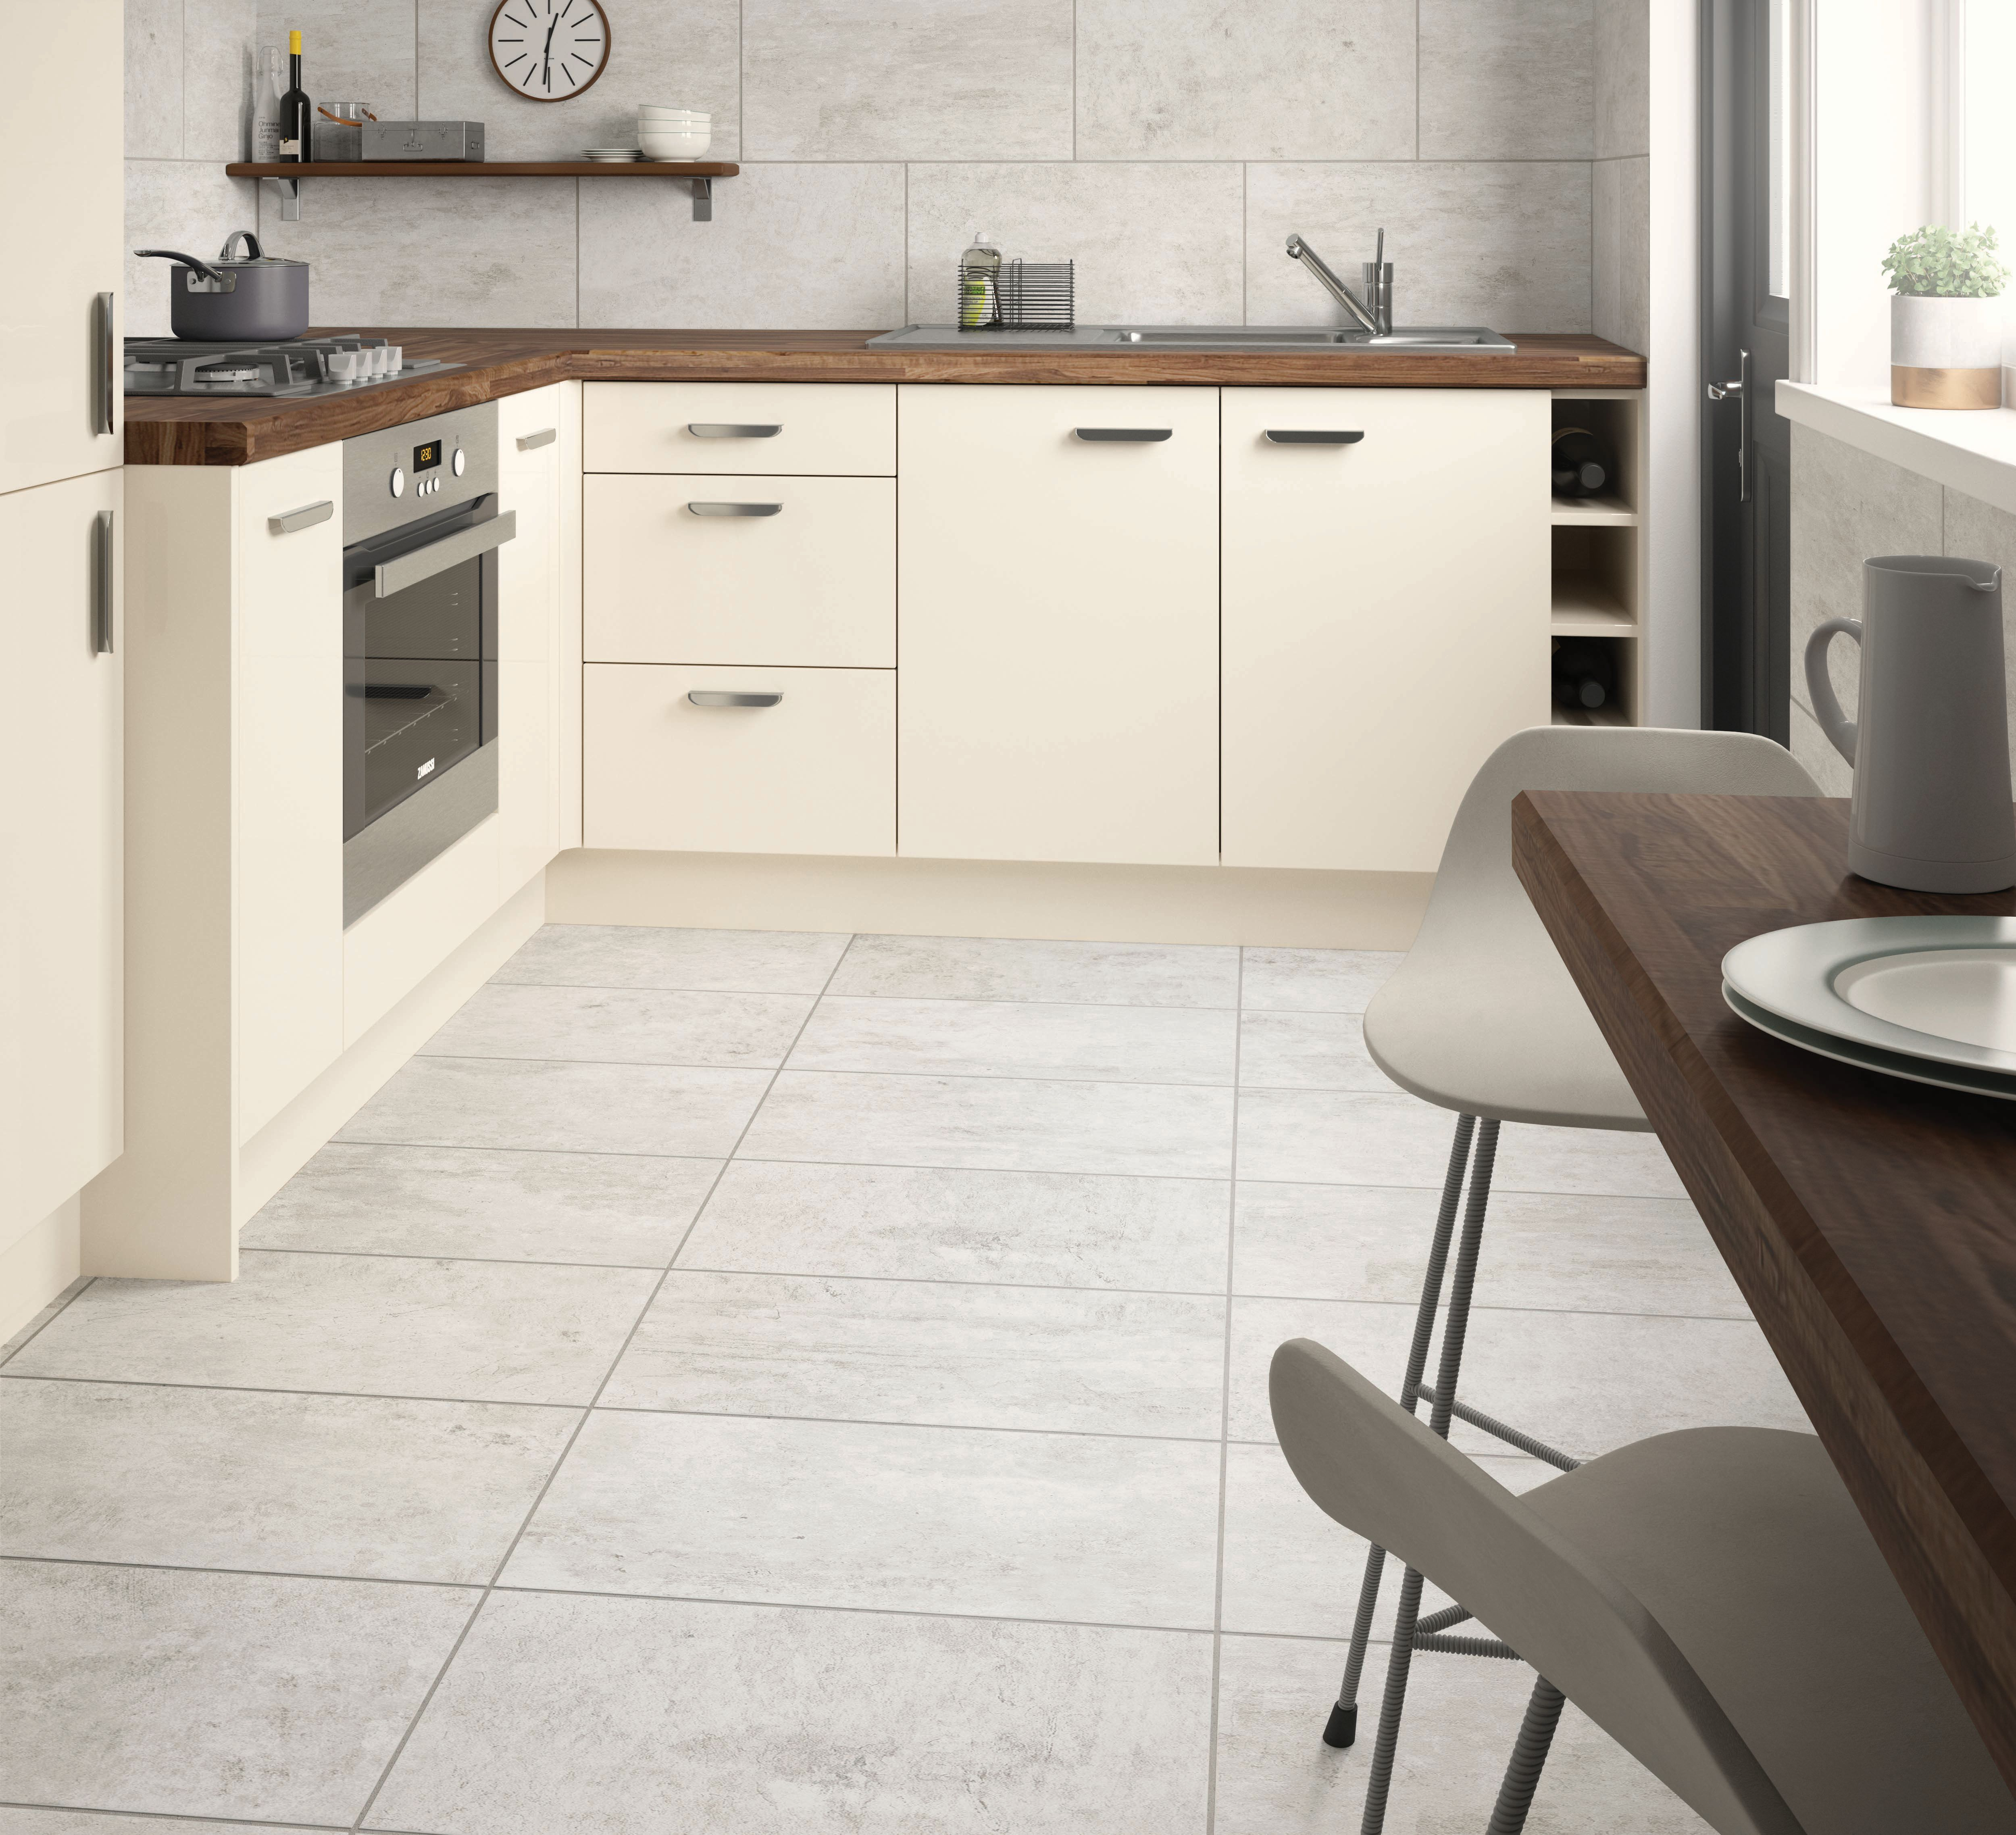 Wickes City Stone Grey Ceramic Tile 600 x 300mm Grey